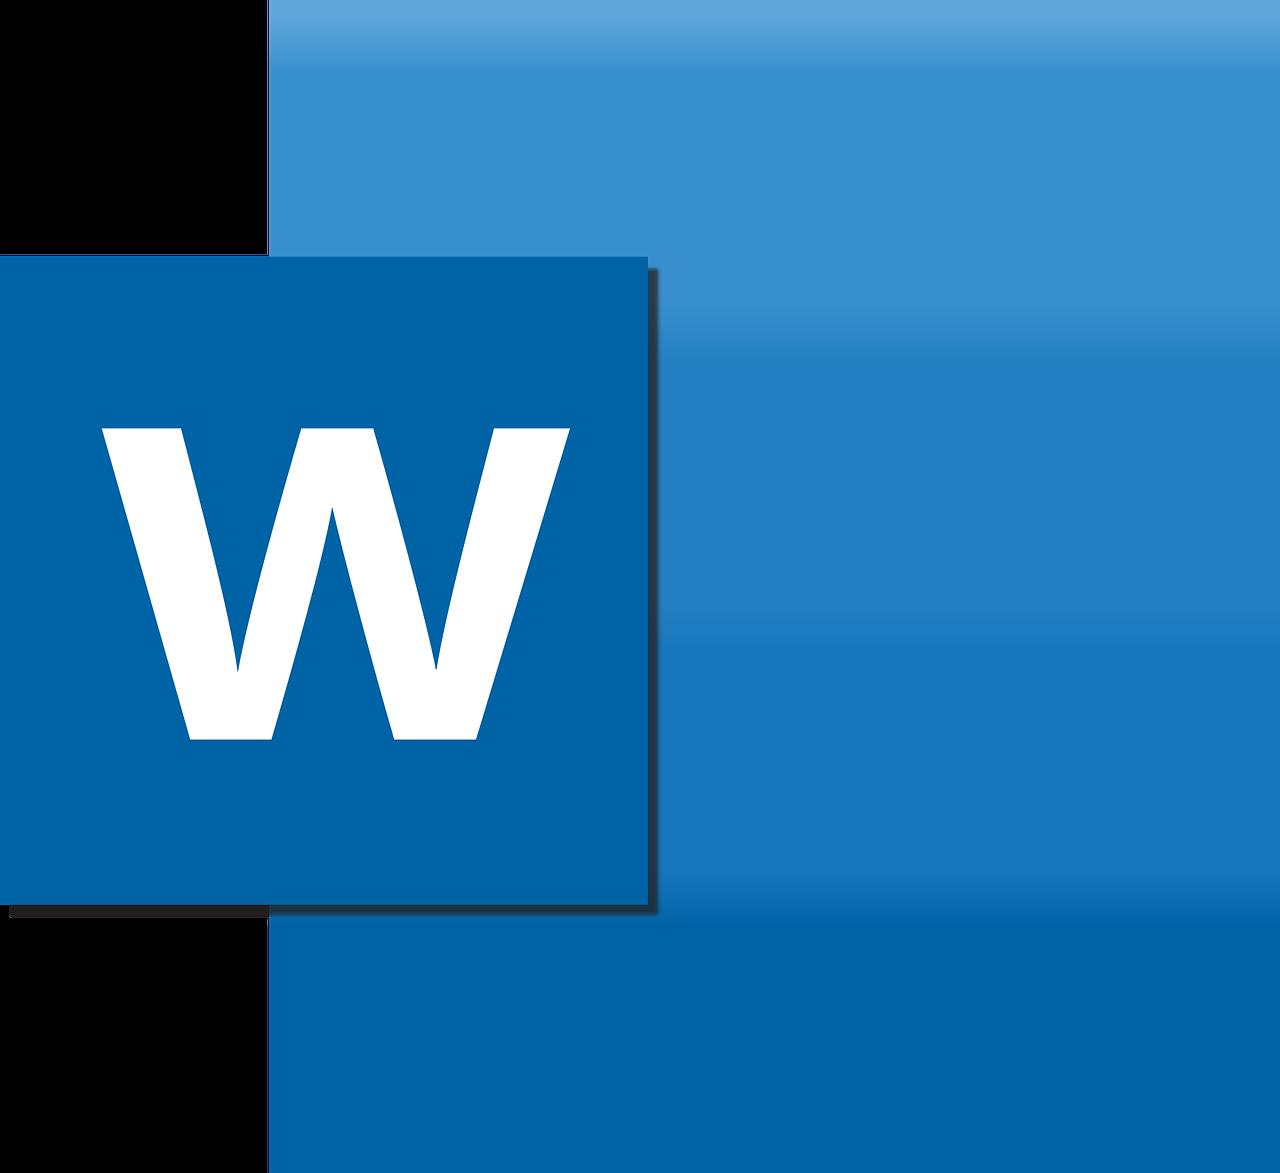 Microsoft Word - Workshop Image